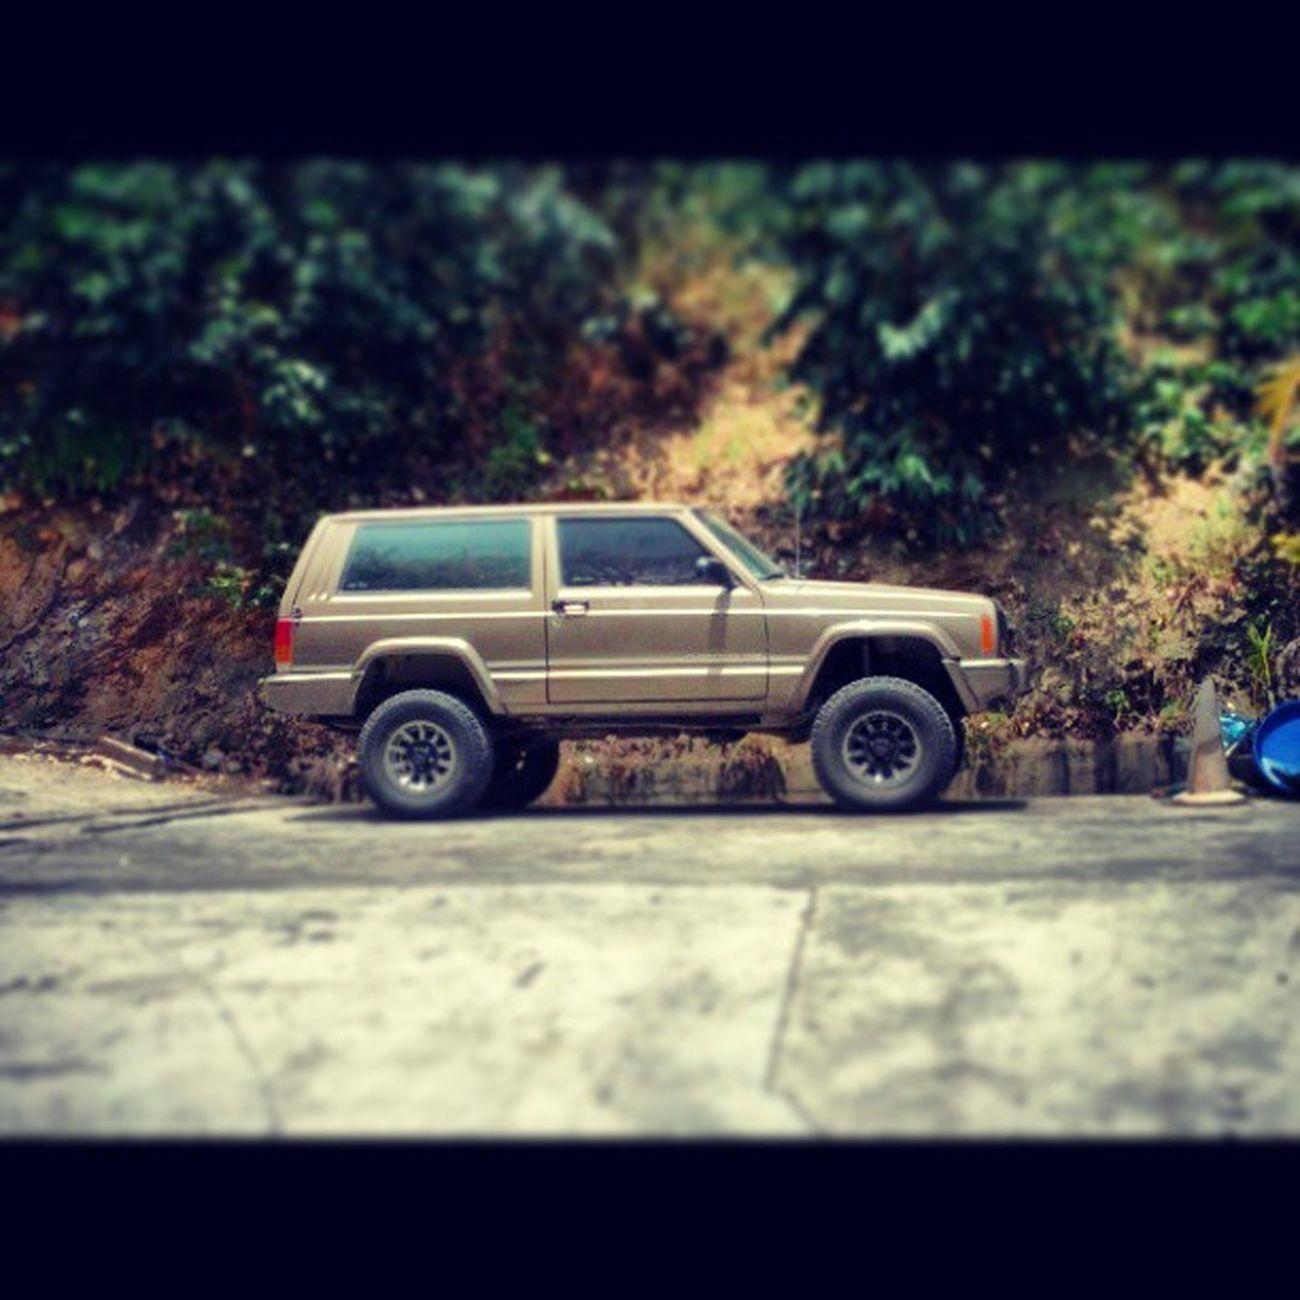 Jeepy Jeep Cherokee 4x4 Allterrain @renenova